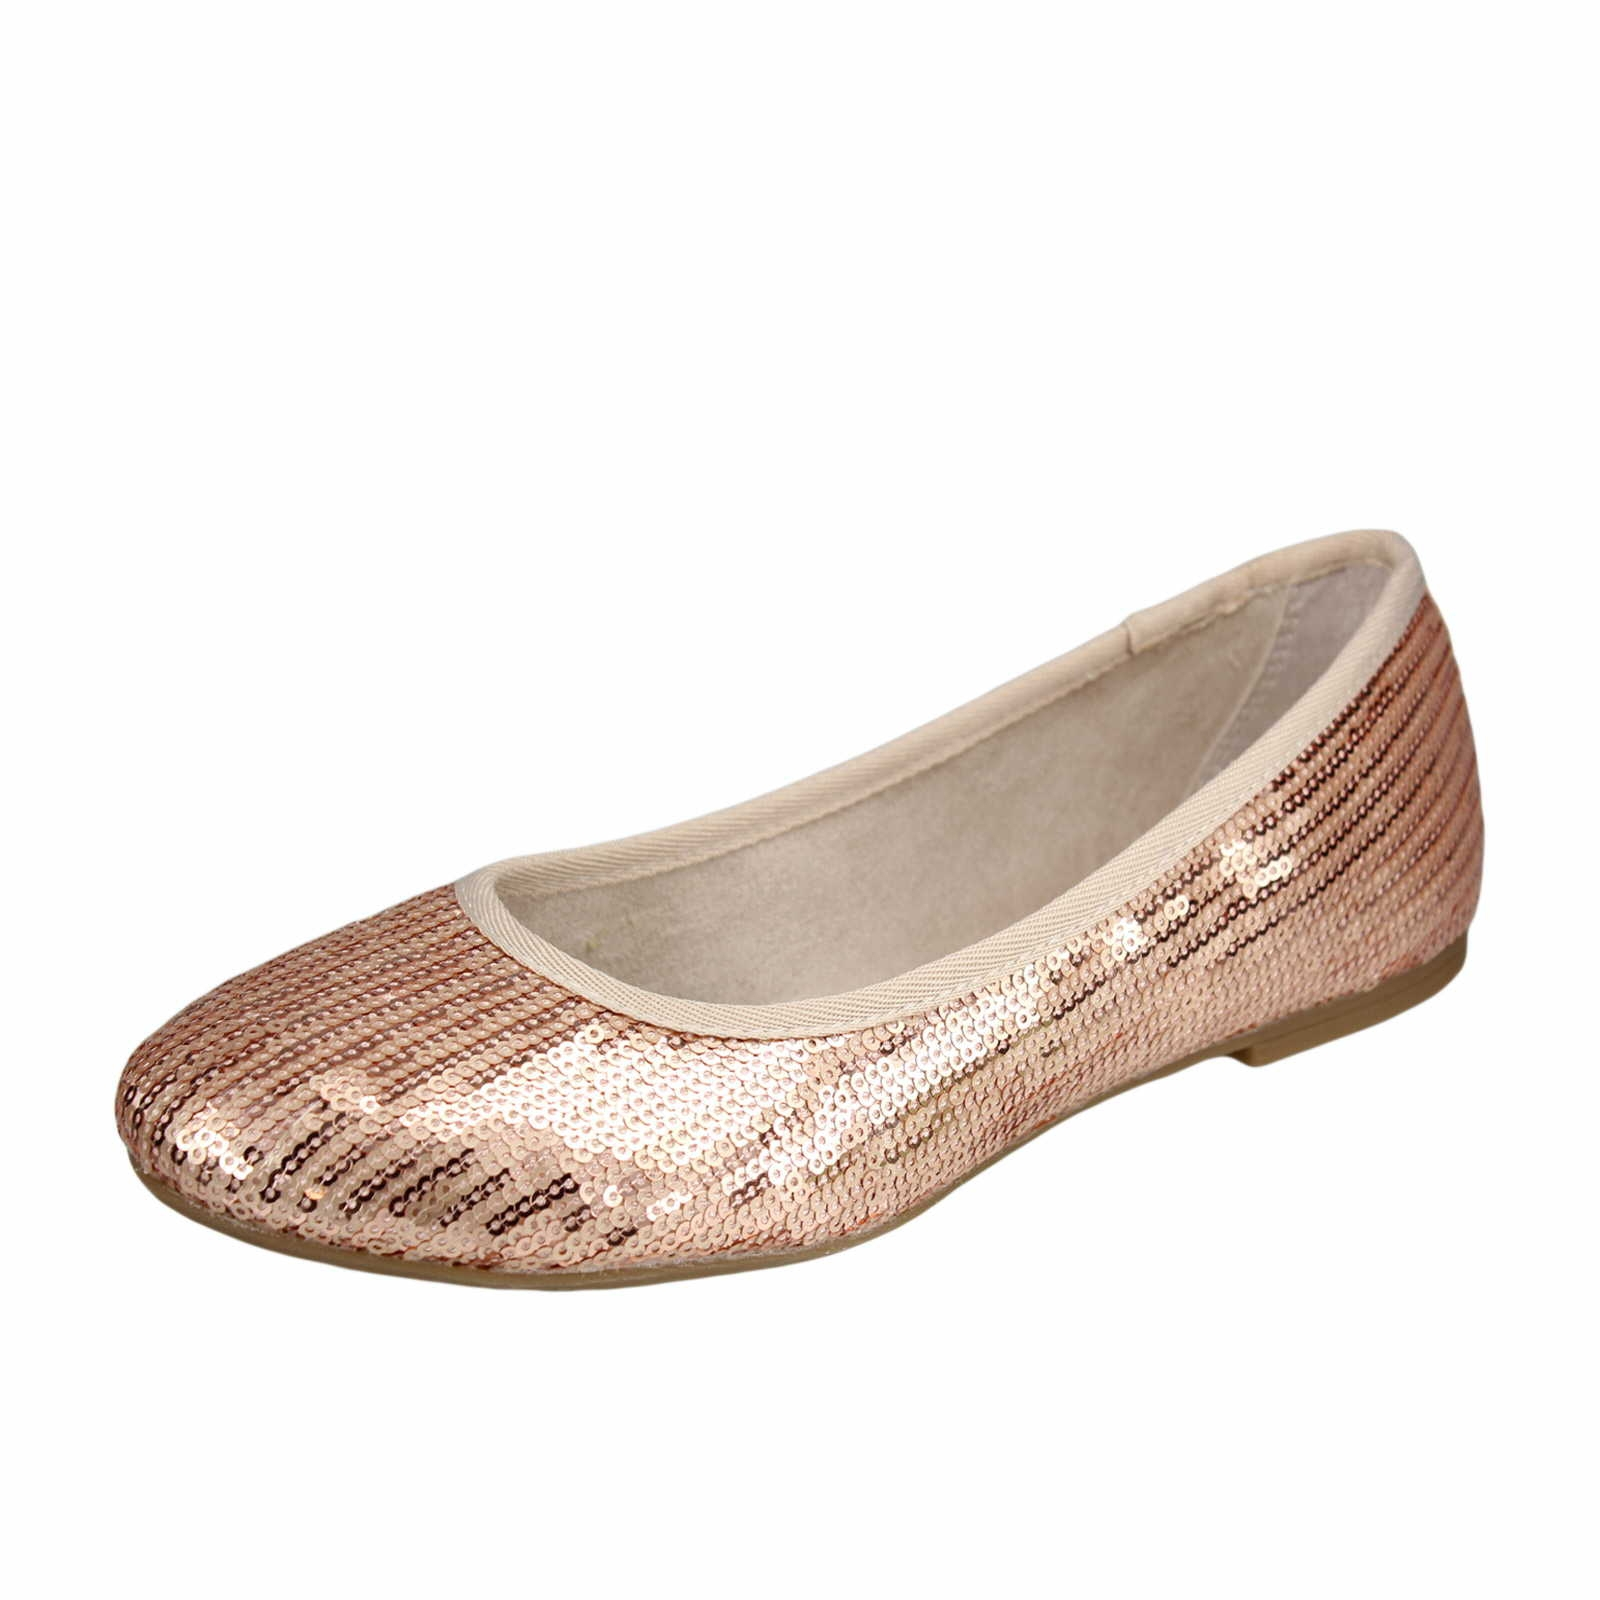 s oliver damen ballerina copper in rot schuhparadies. Black Bedroom Furniture Sets. Home Design Ideas